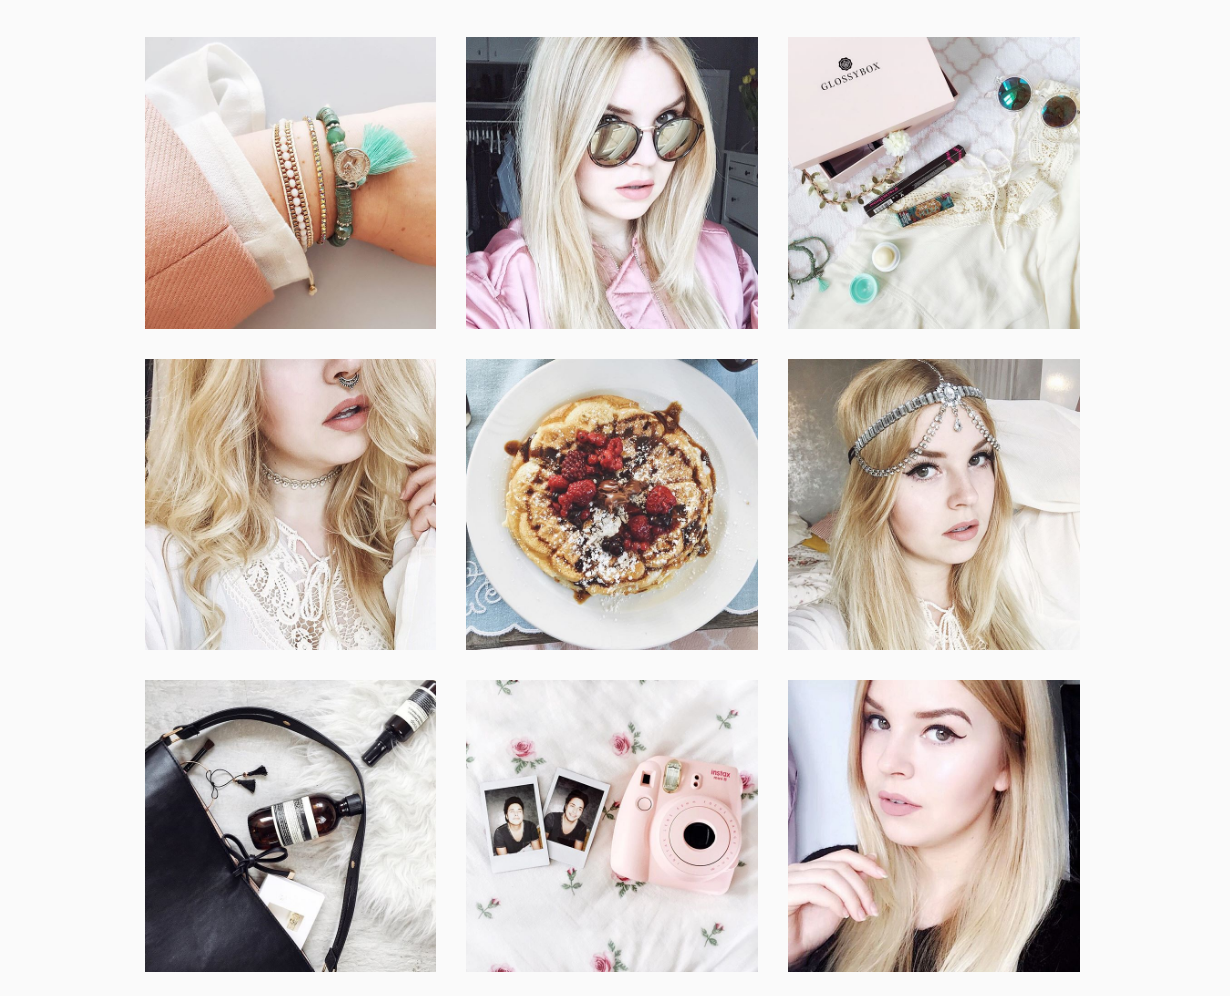 instagram_itsgoldie_modeblog_fashhionblog_hannover_hamburg